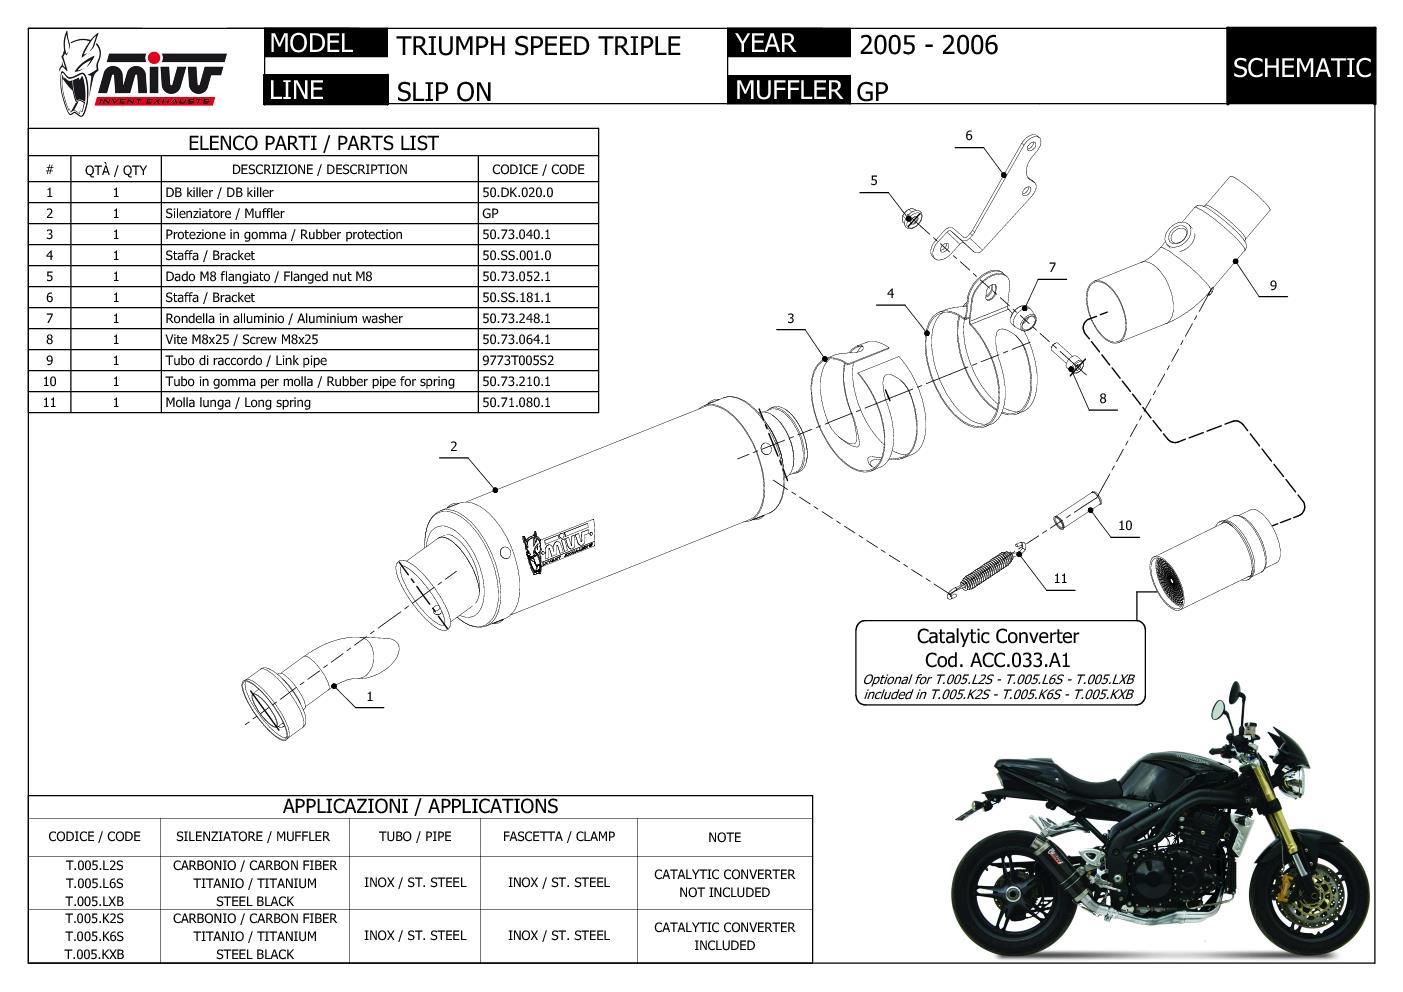 TRIUMPH SPEED TRIPLE 2005-2006 STORM By MIVV Scarico GP